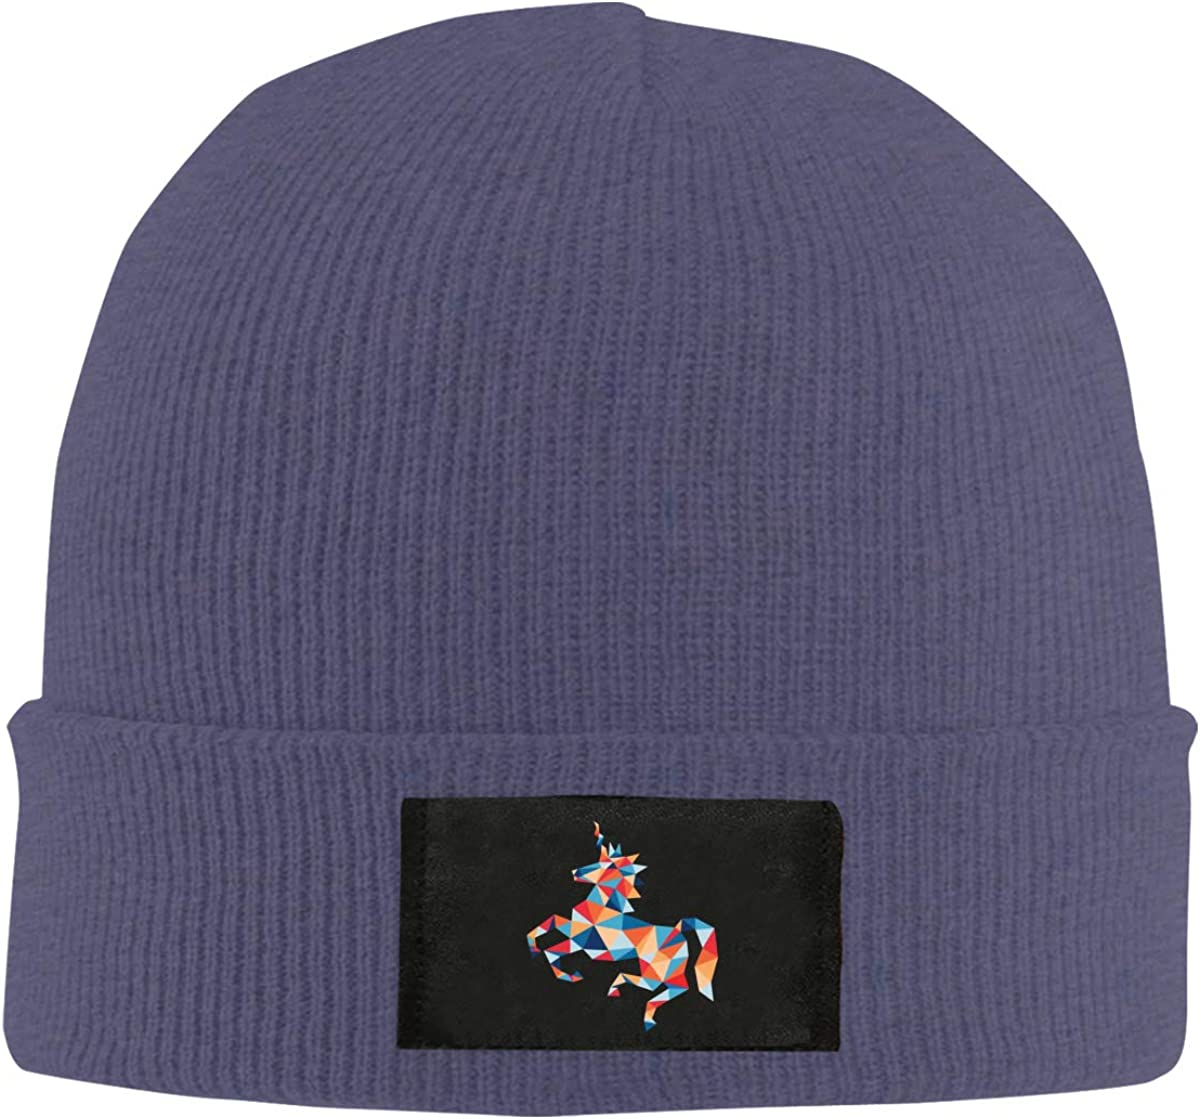 Colored Unicorn Unisex Top Level Beanie Men Women Unisex Stylish Slouch Beanie Hats Black